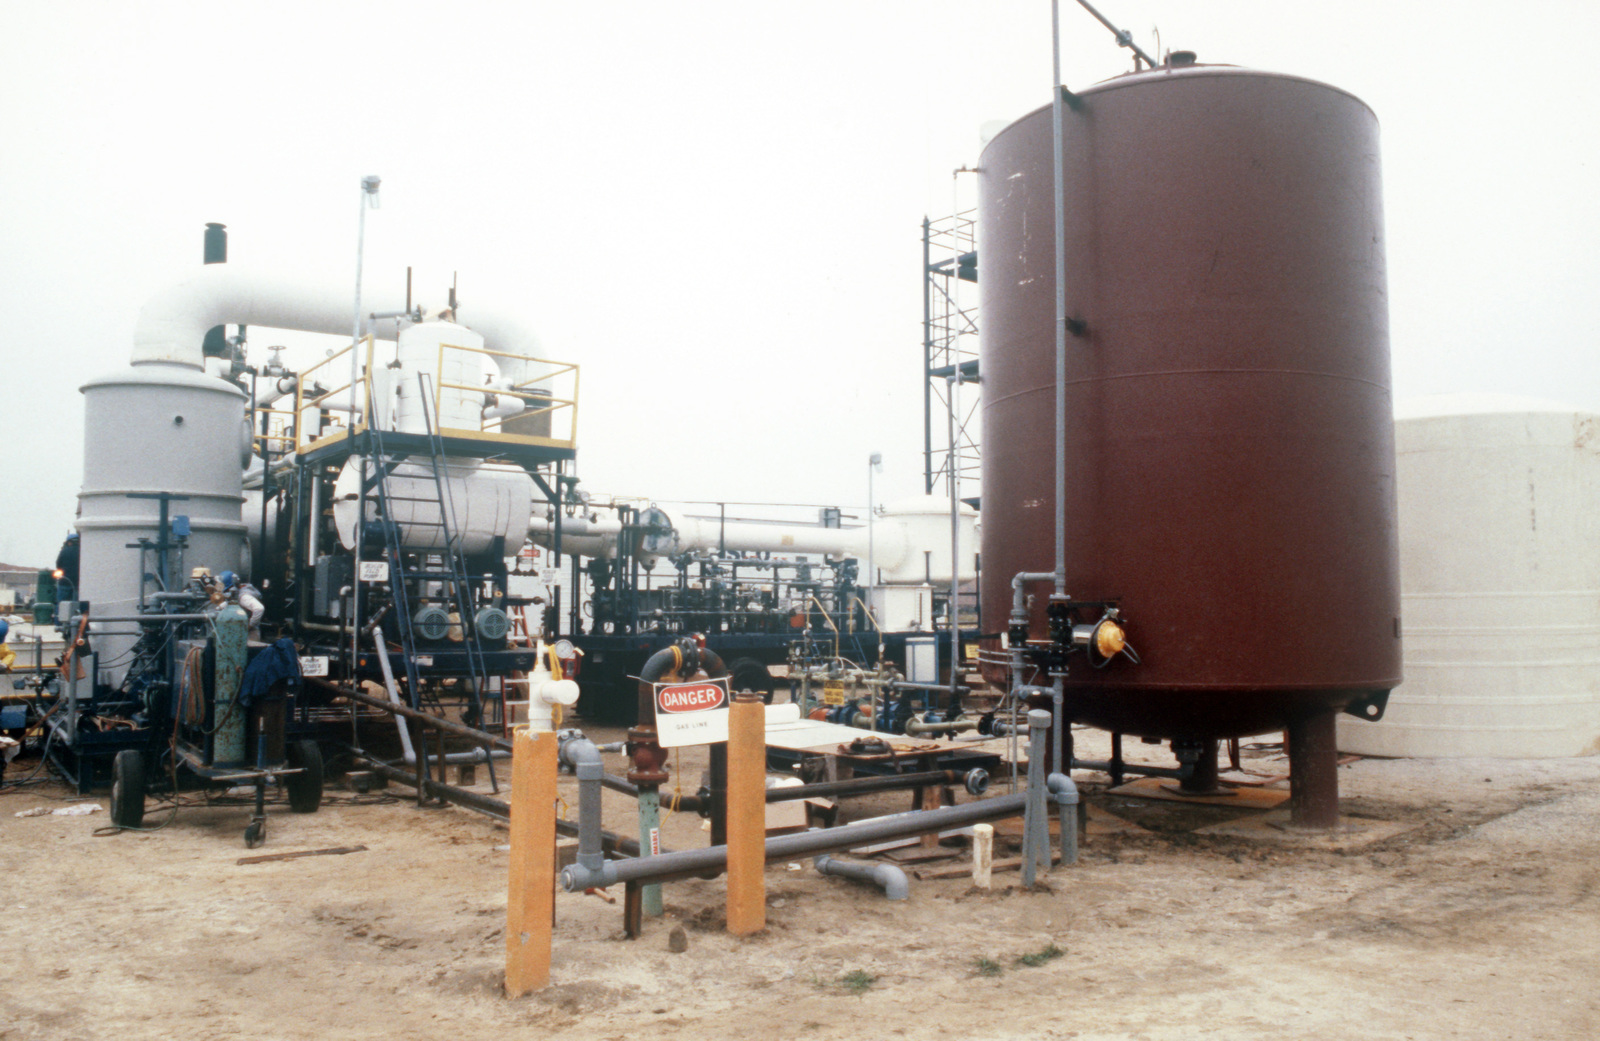 Civilian technicians prepare the dioxin incinerator for operation at the Naval Construction Battalion Center dioxin elimination test site